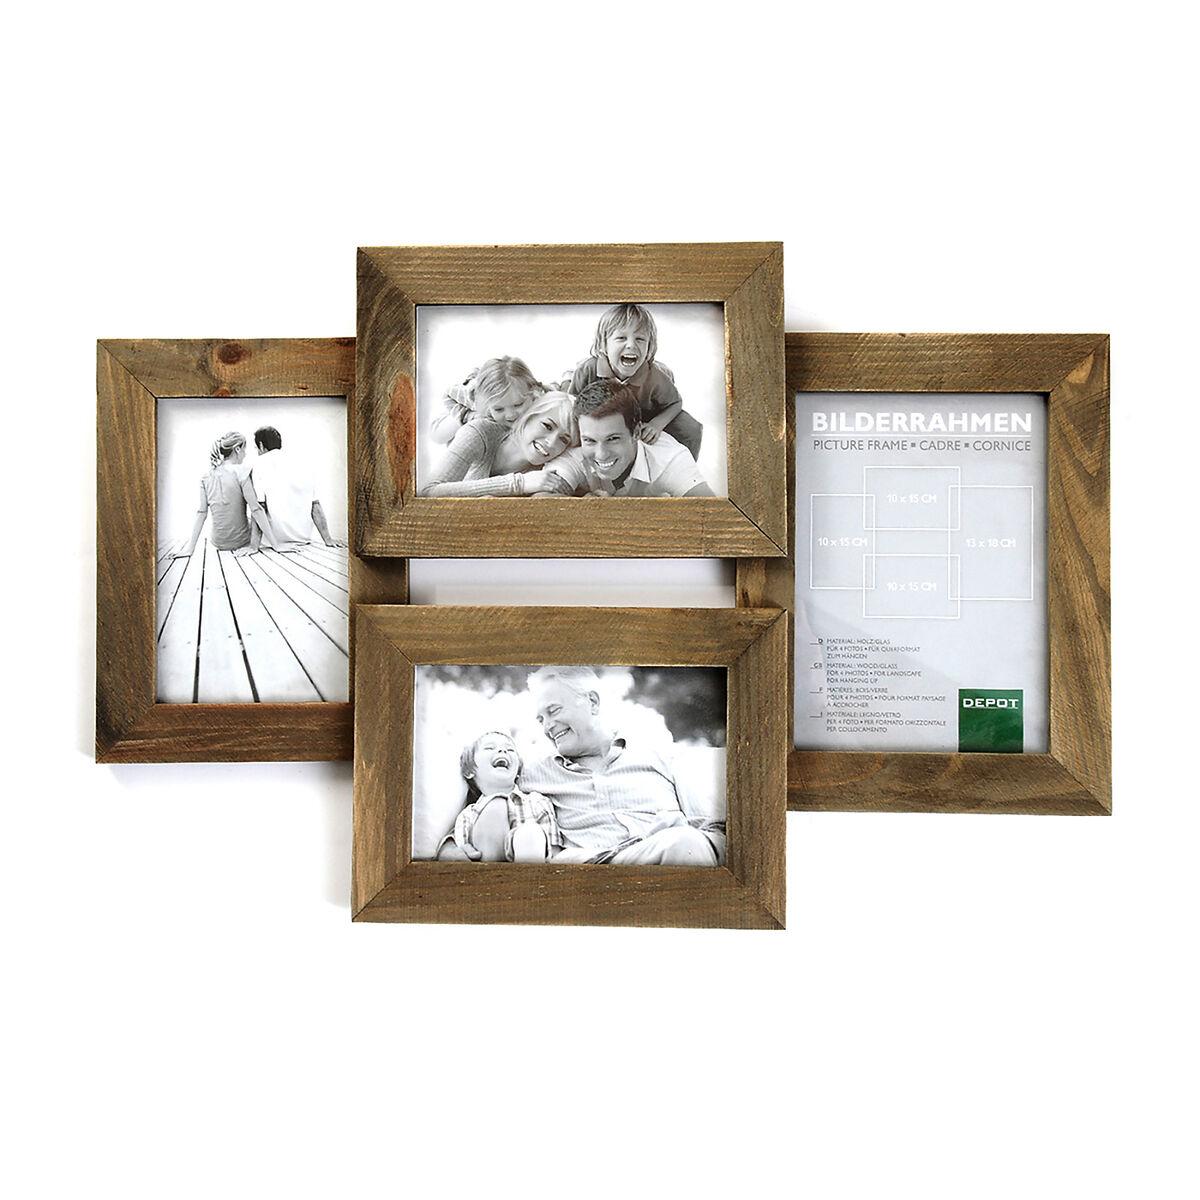 bilderrahmen f r 4 fotos 10x15cm 13x18cm depot de. Black Bedroom Furniture Sets. Home Design Ideas